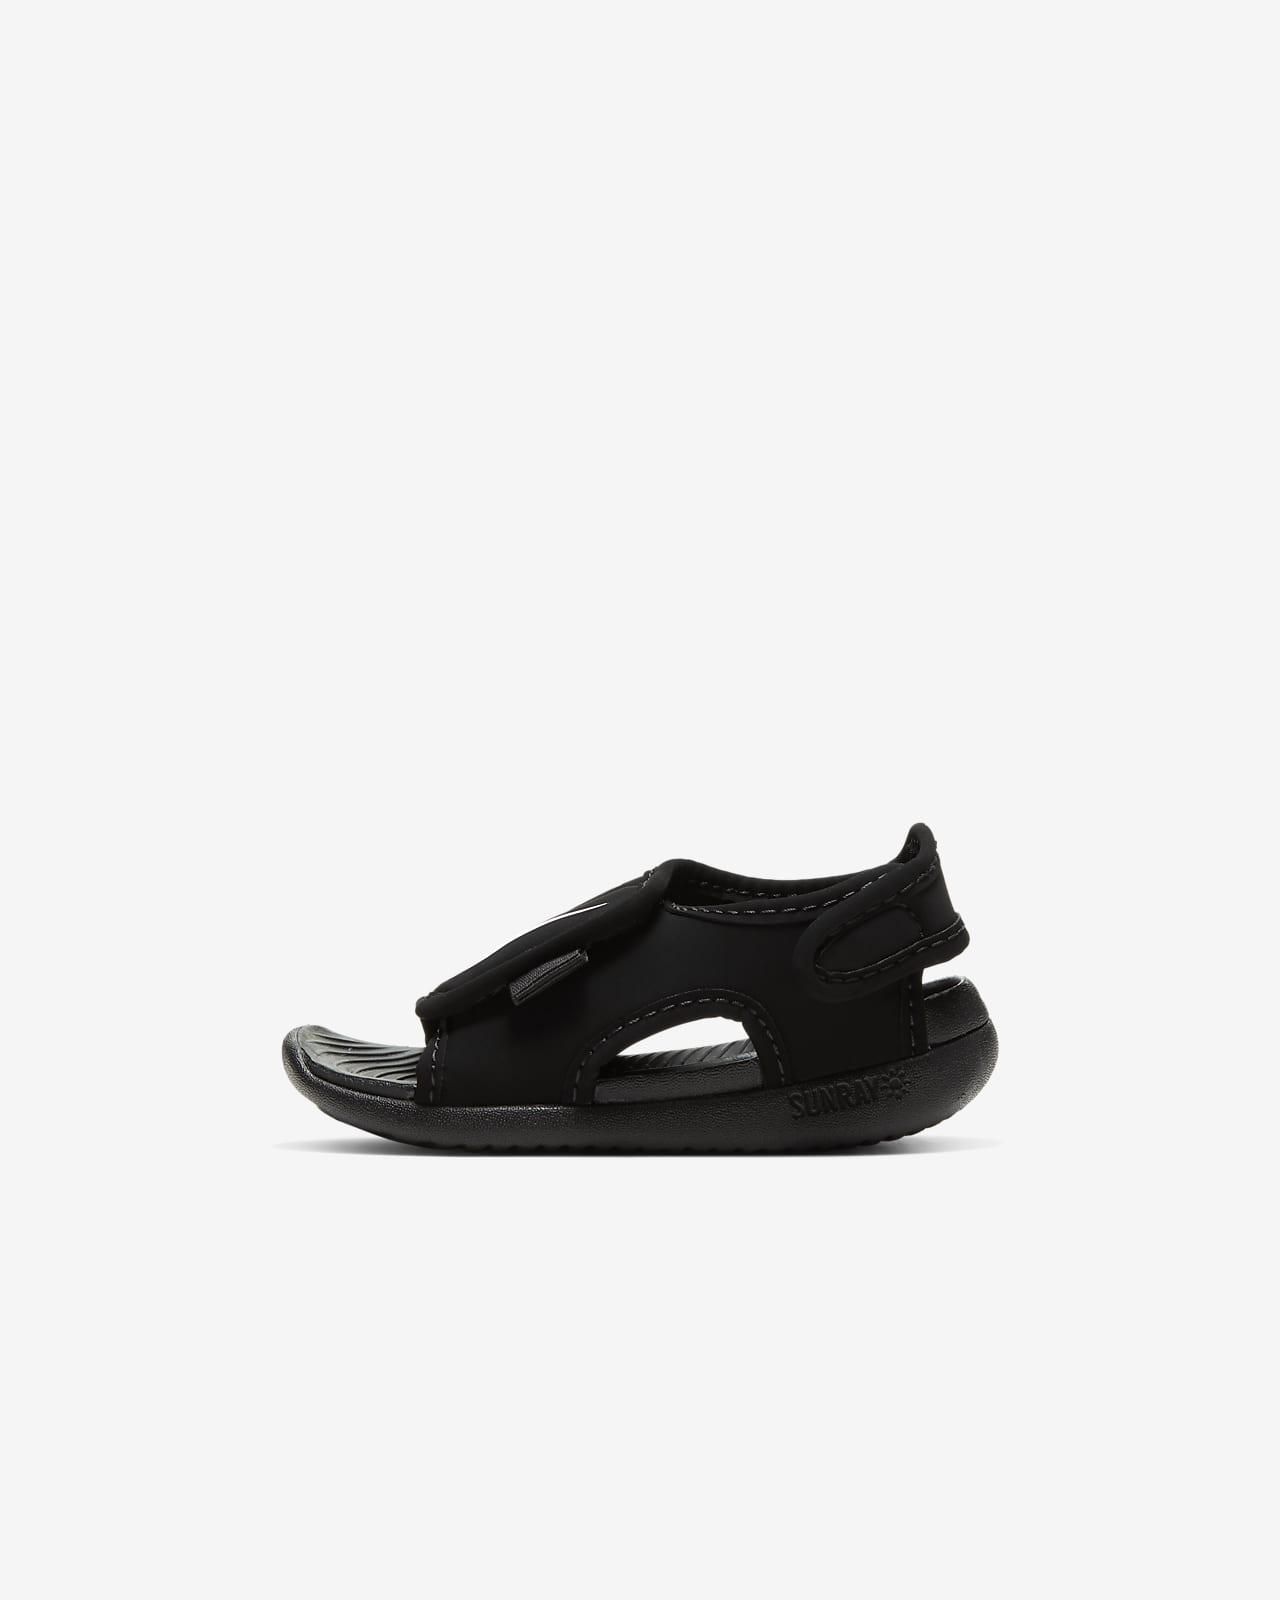 Nike Sunray Adjust 5 V2 Sandale für Kleinkinder